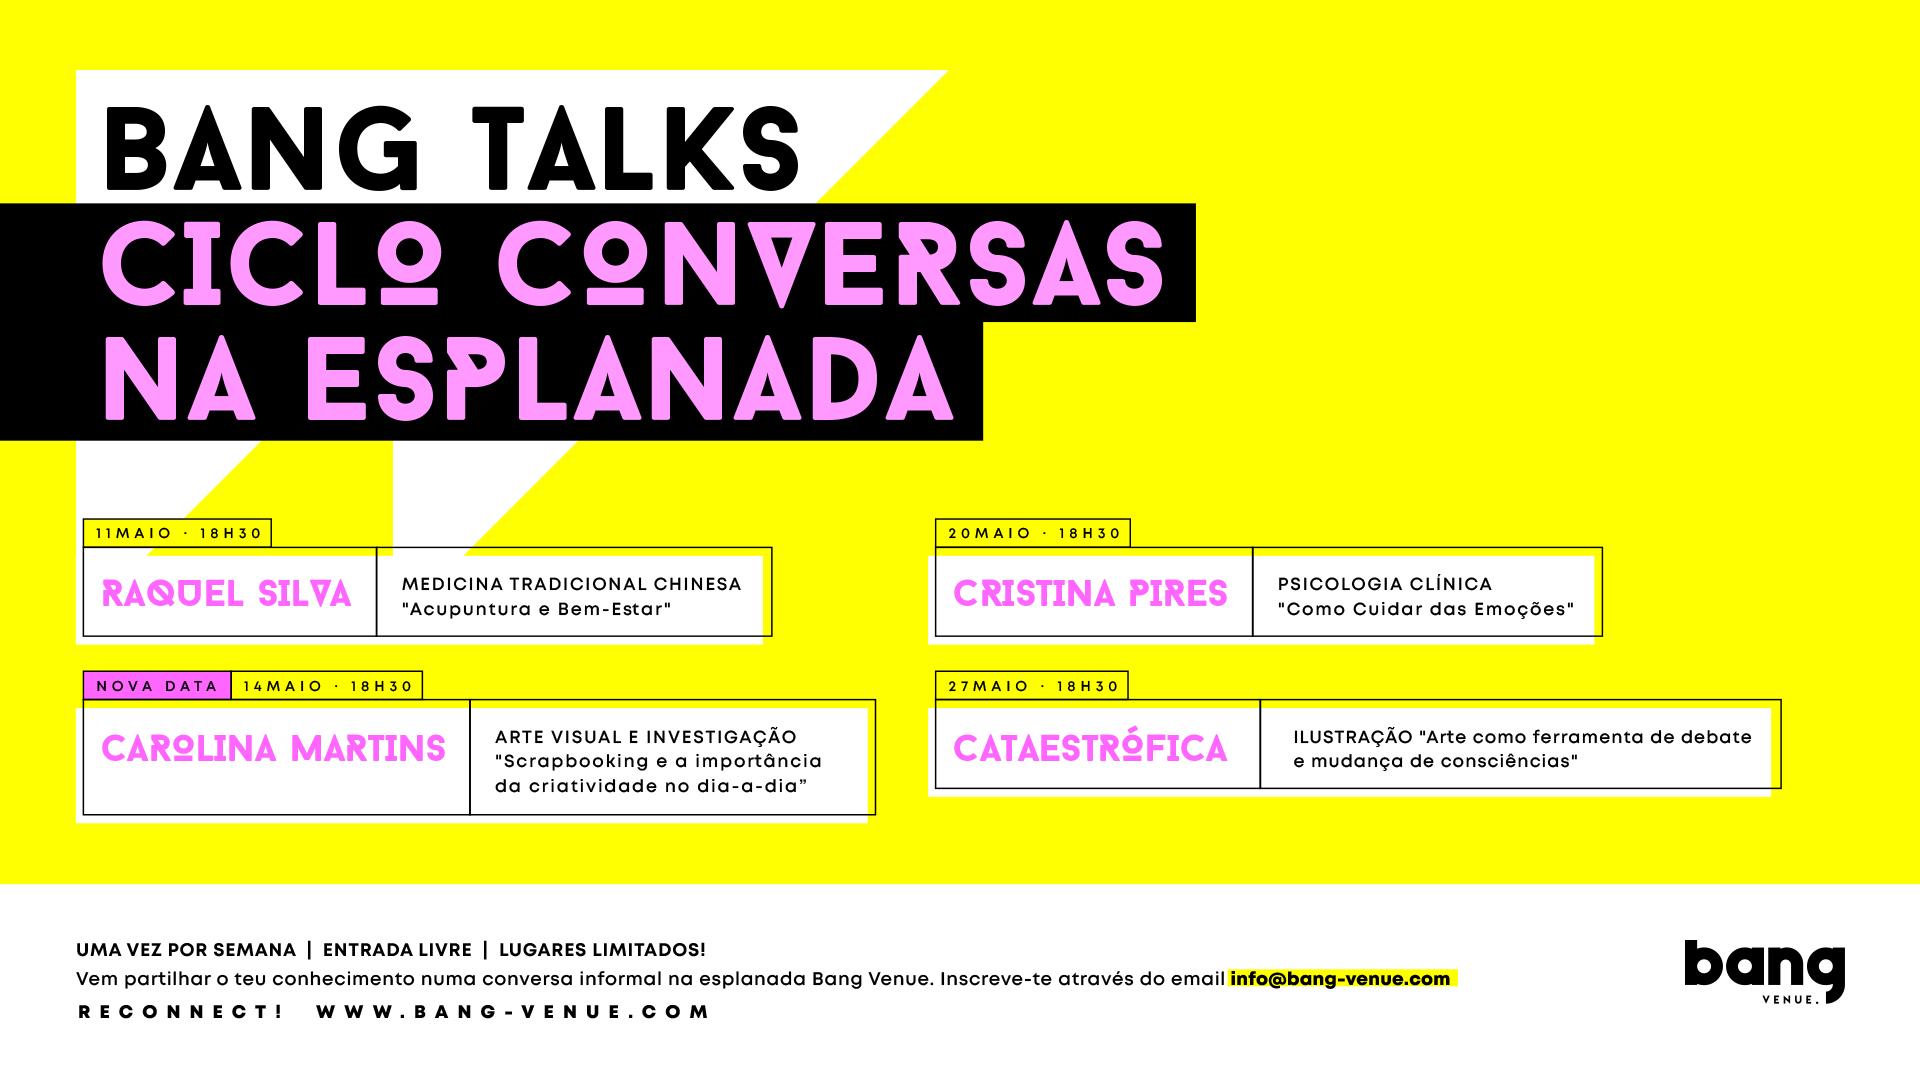 Bang Talks | Ciclo Conversas na Esplanada | Entrada Livre